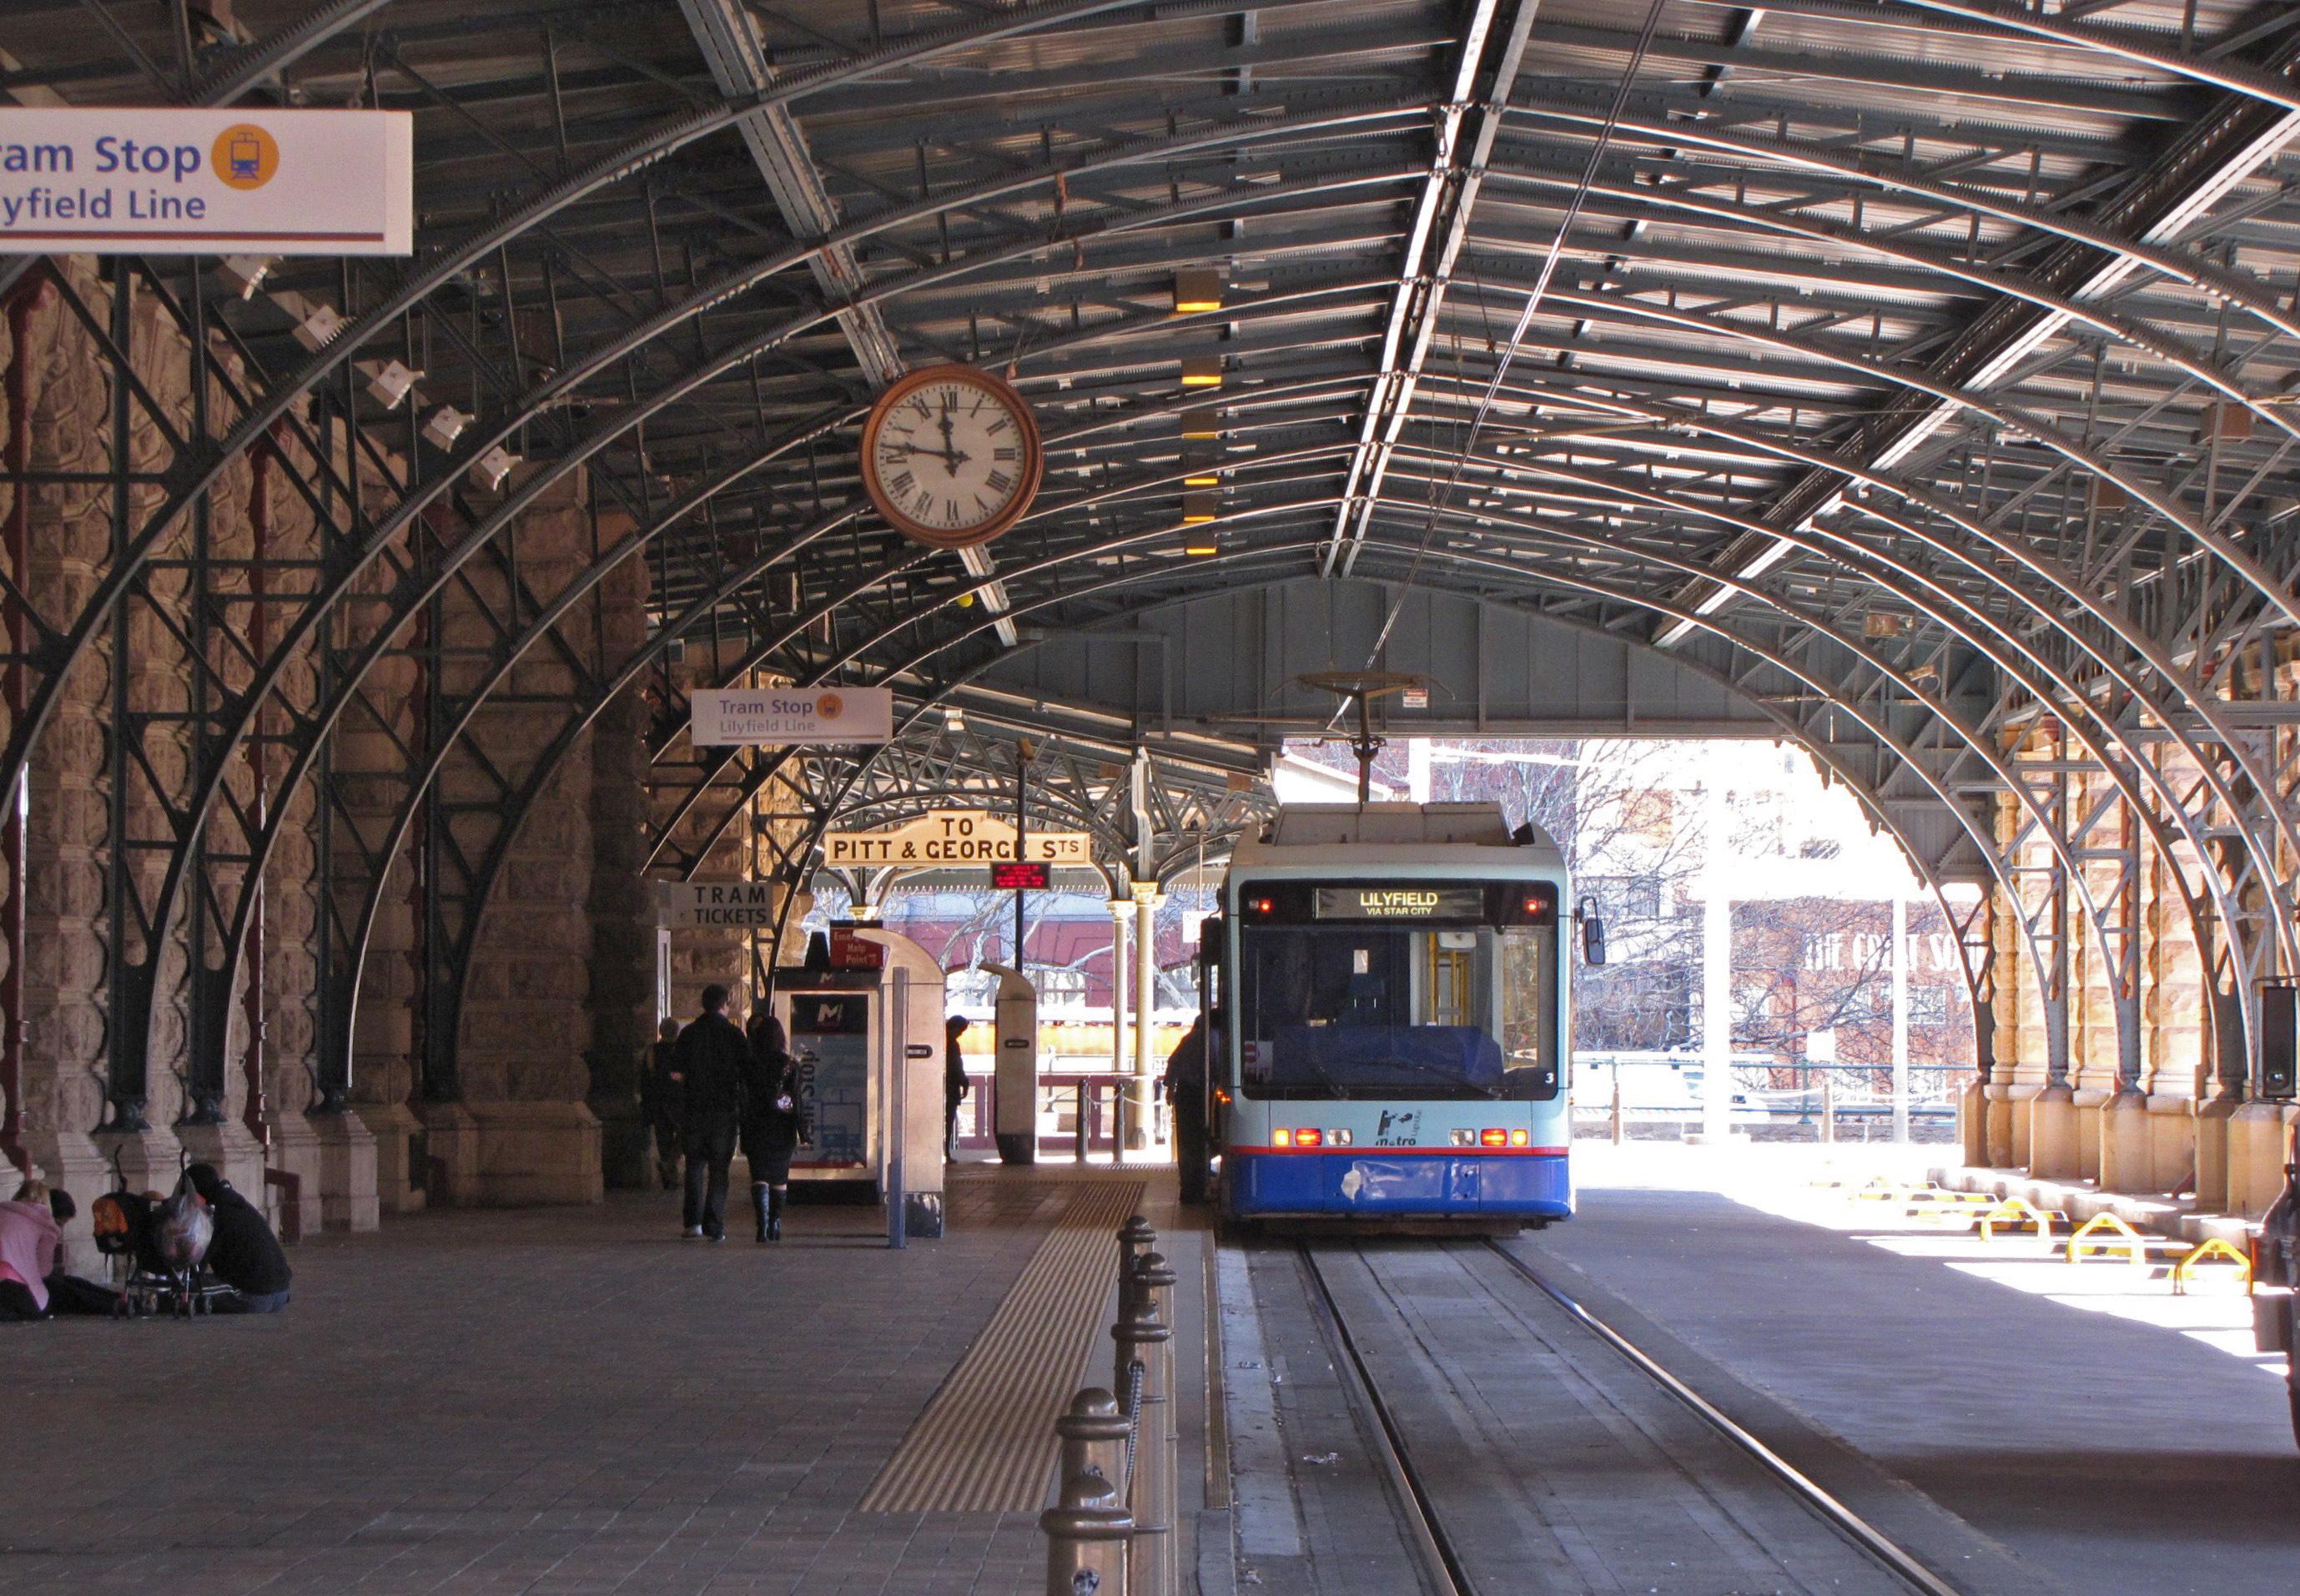 Adelaide Metro Lost Property